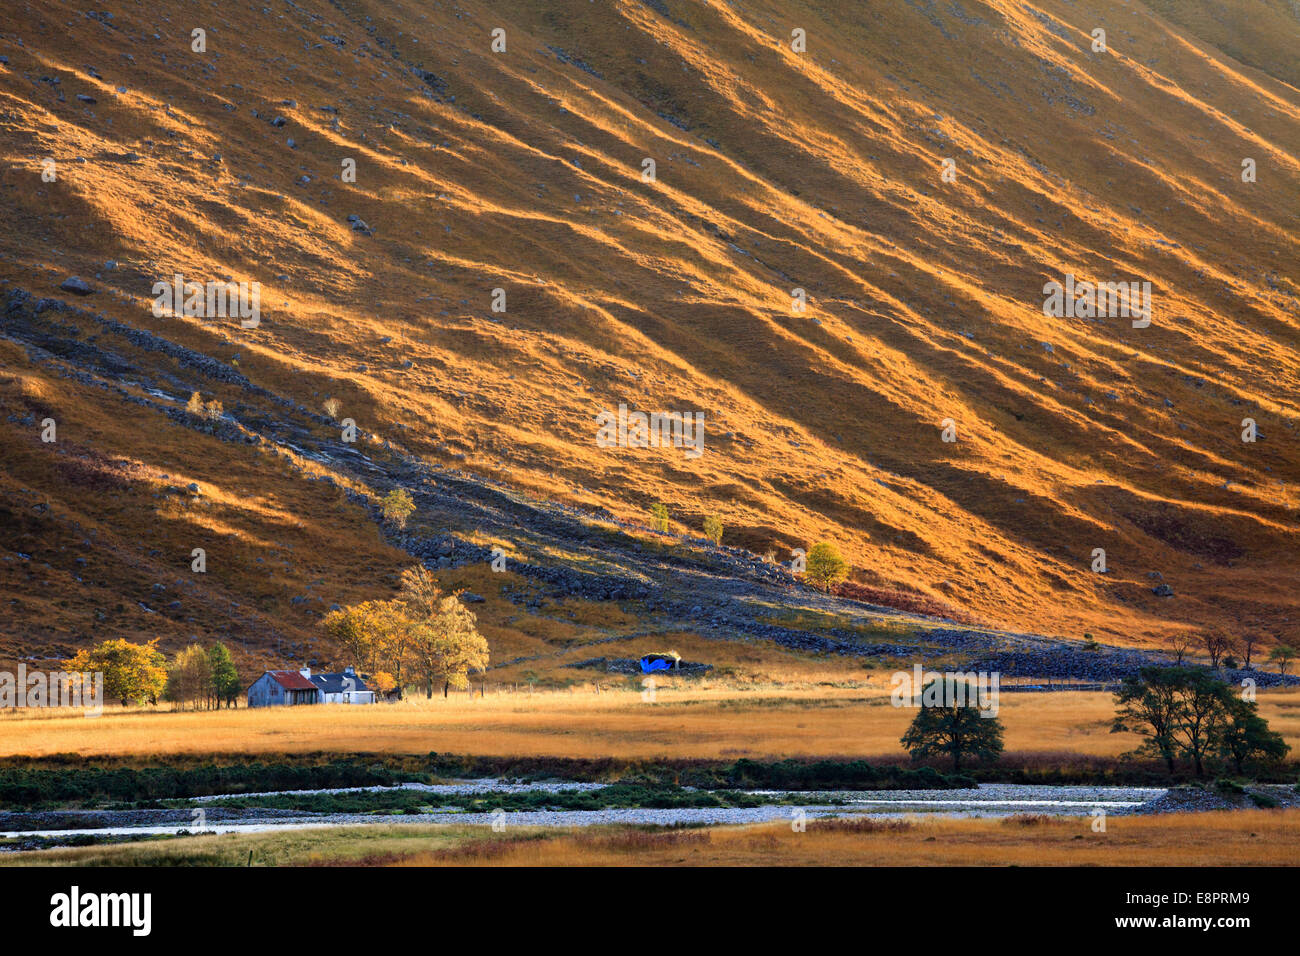 An isolated farmstead in Glen Etive, Scotland - Stock Image